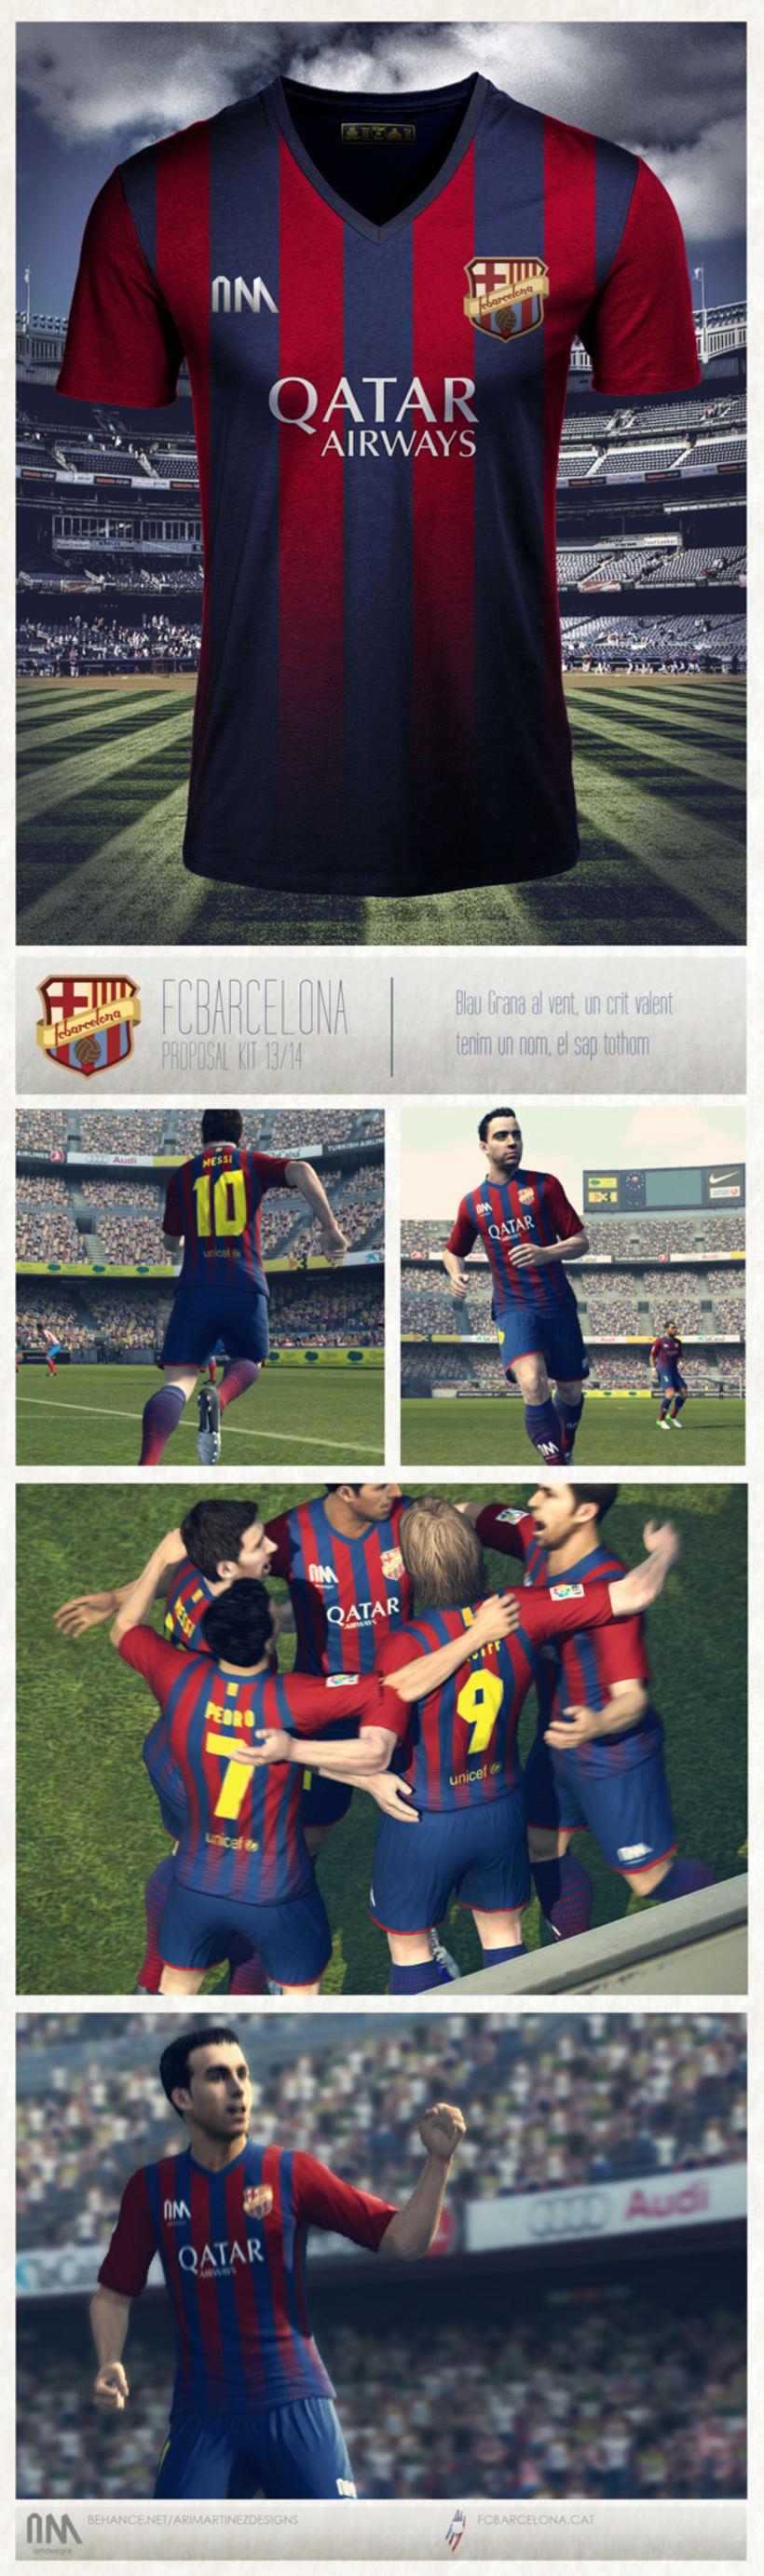 FCBarcelona 11